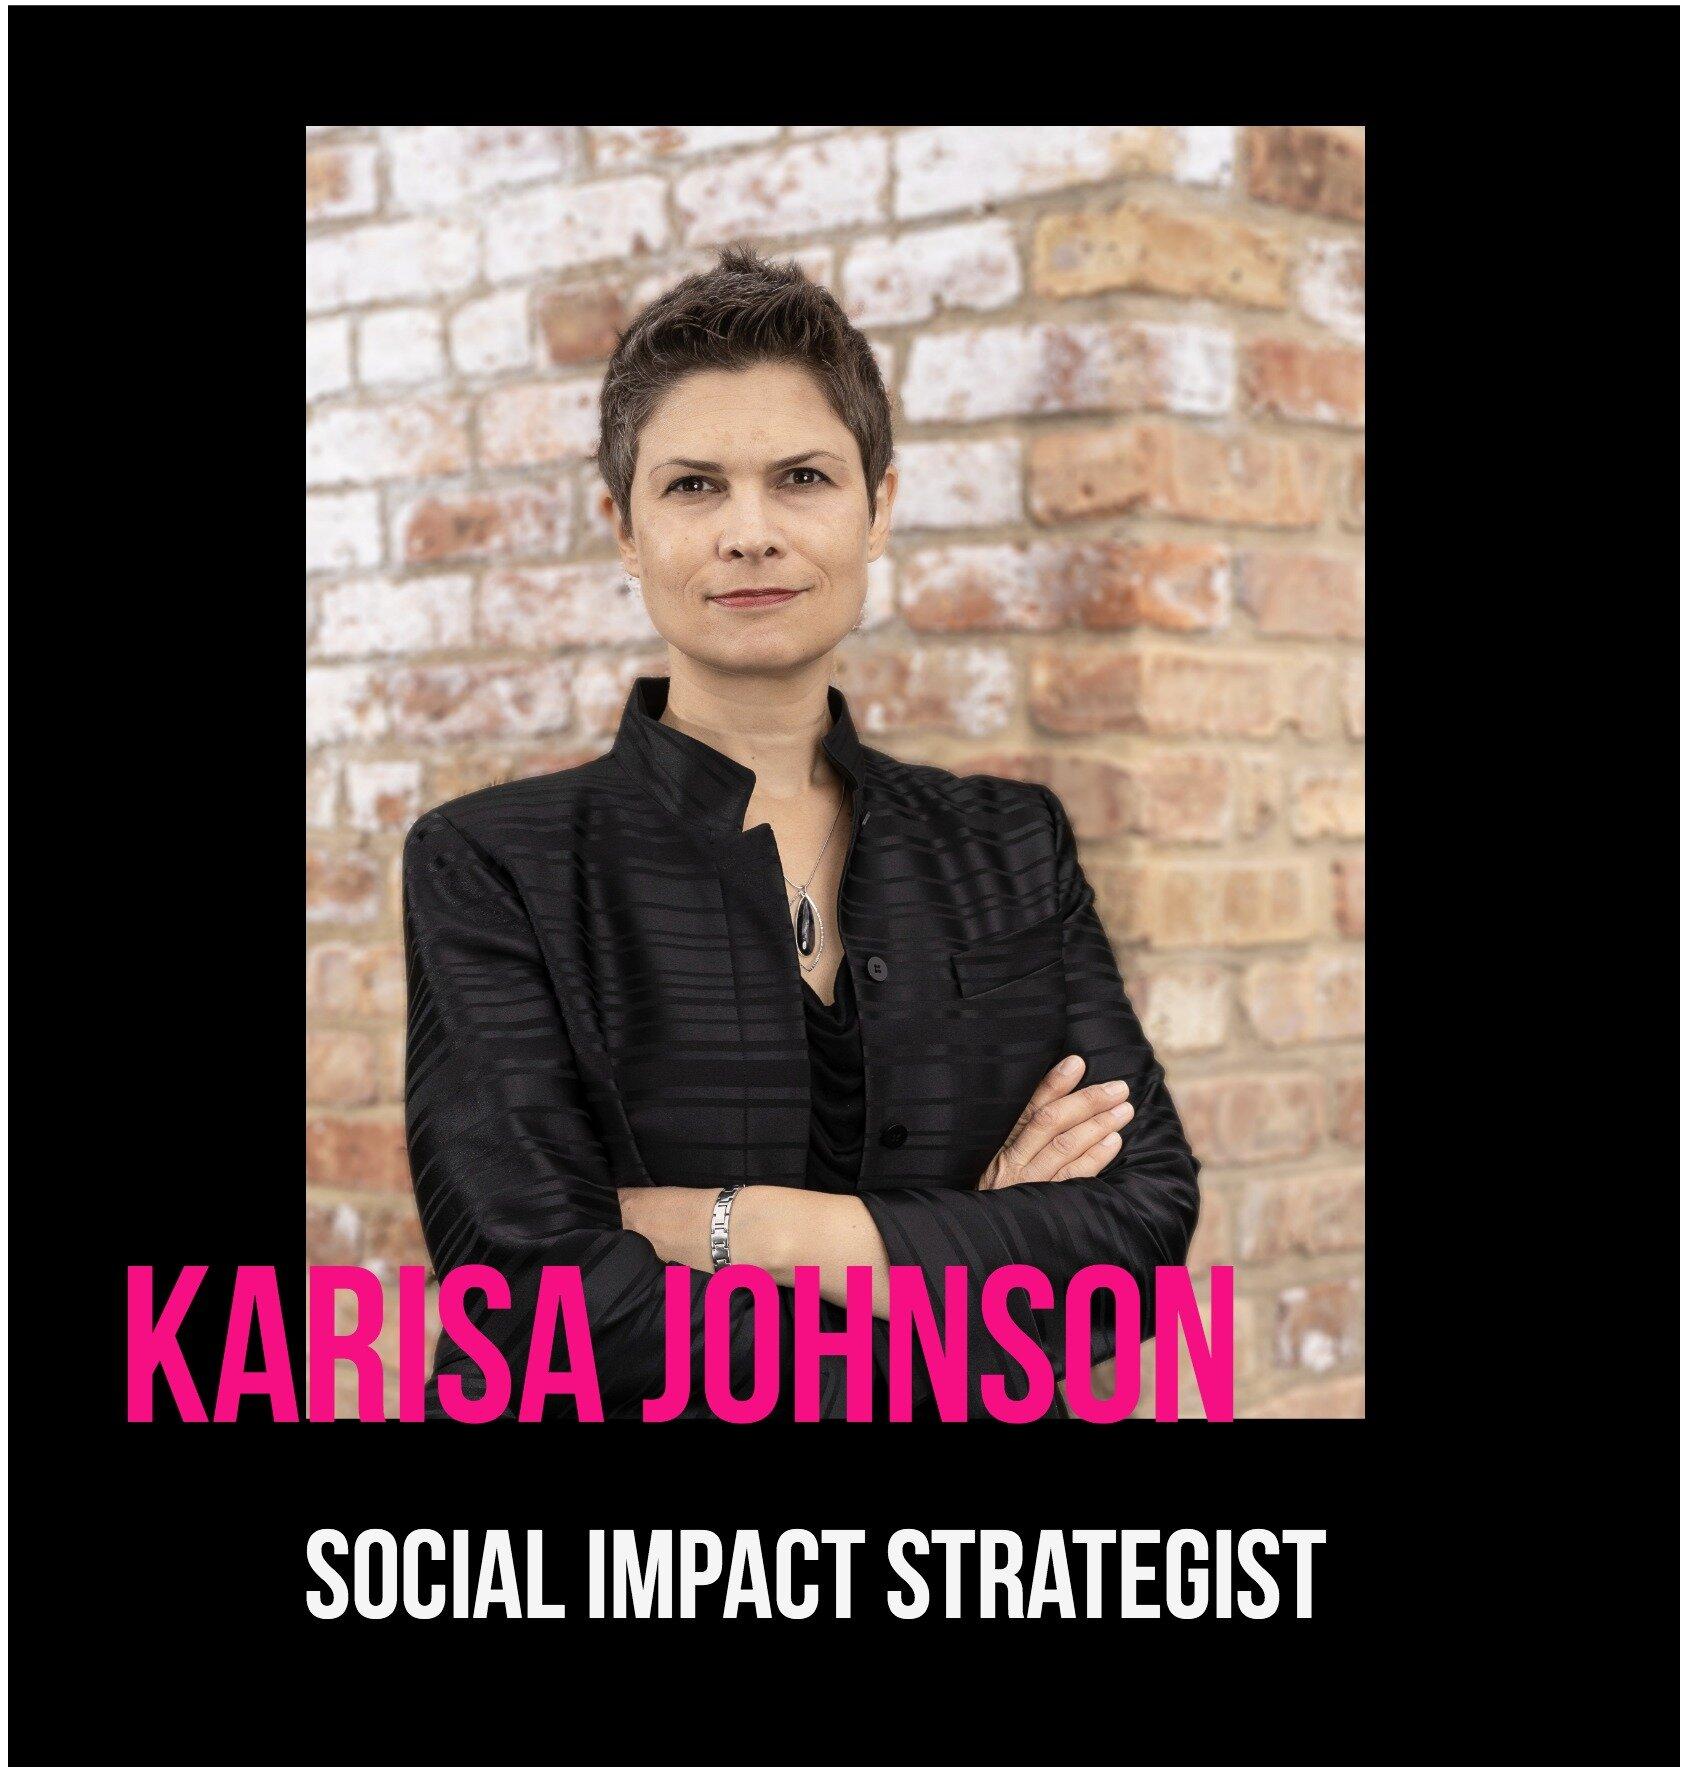 THE JILLS OF ALL TRADES™ Karisa Johnson Social Impact Strategiest